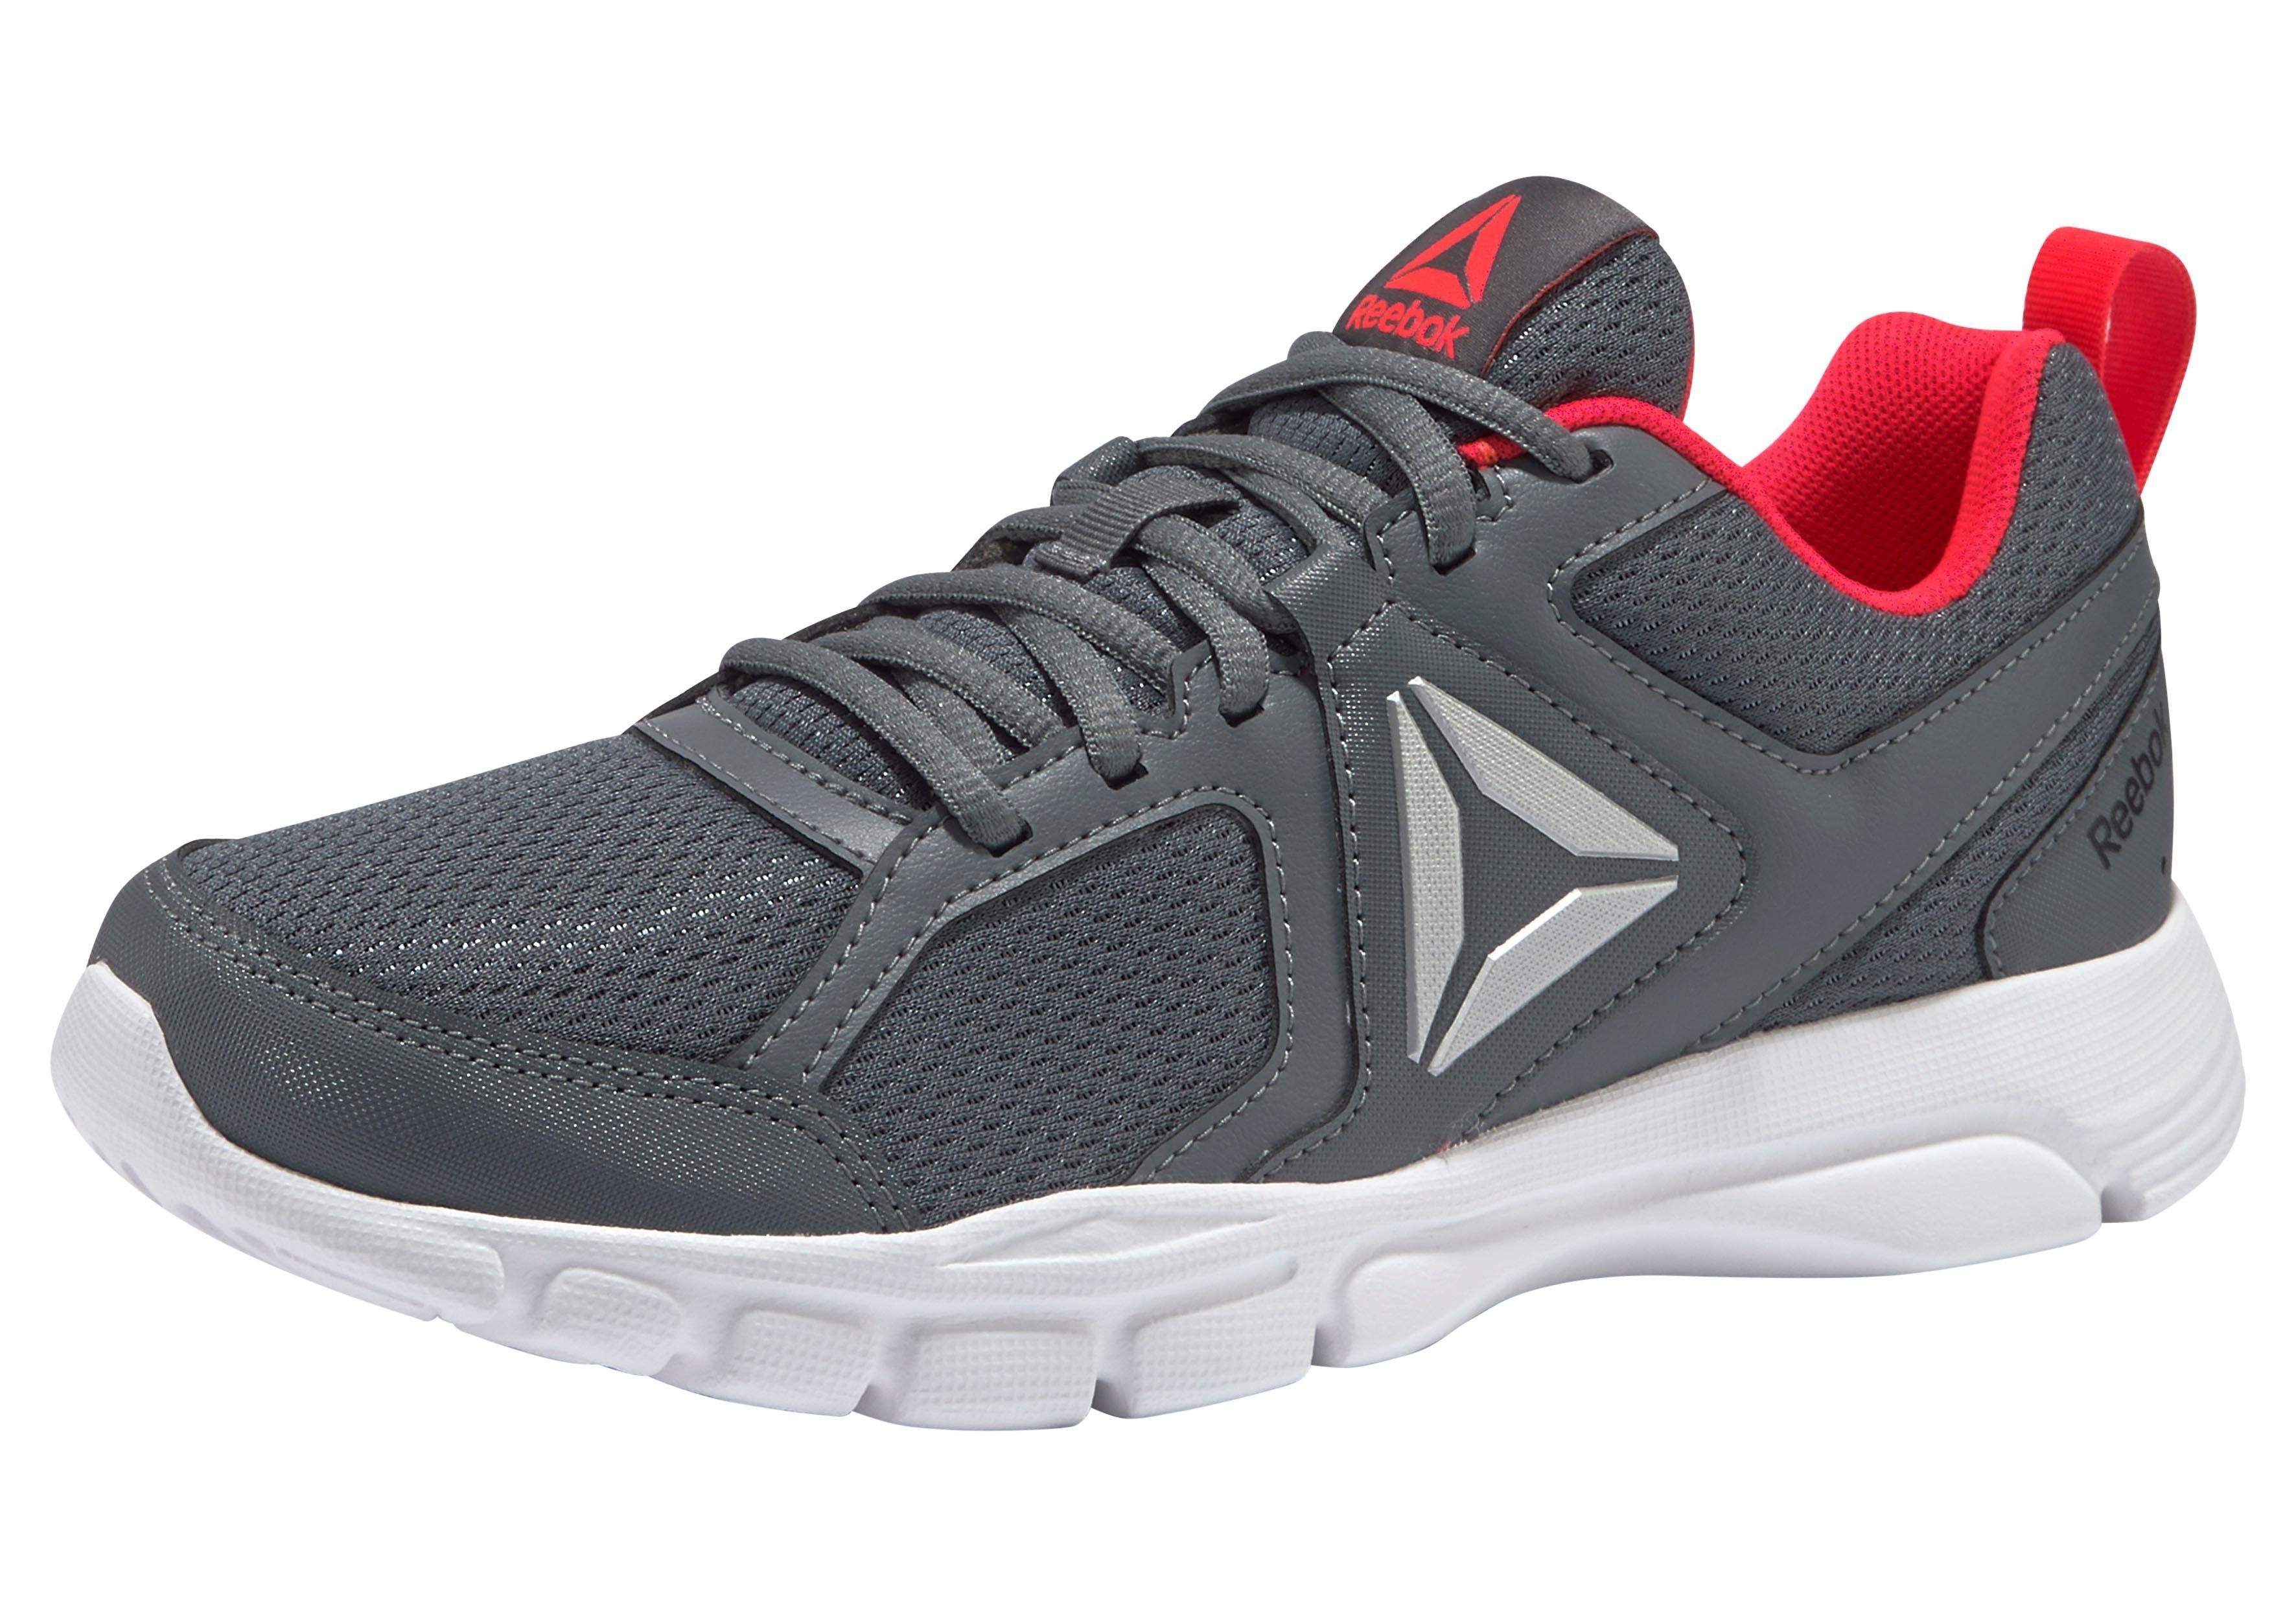 04fa919e5f6 Fitness schoenen dames kopen? Bekijk ons aanbod | OTTO